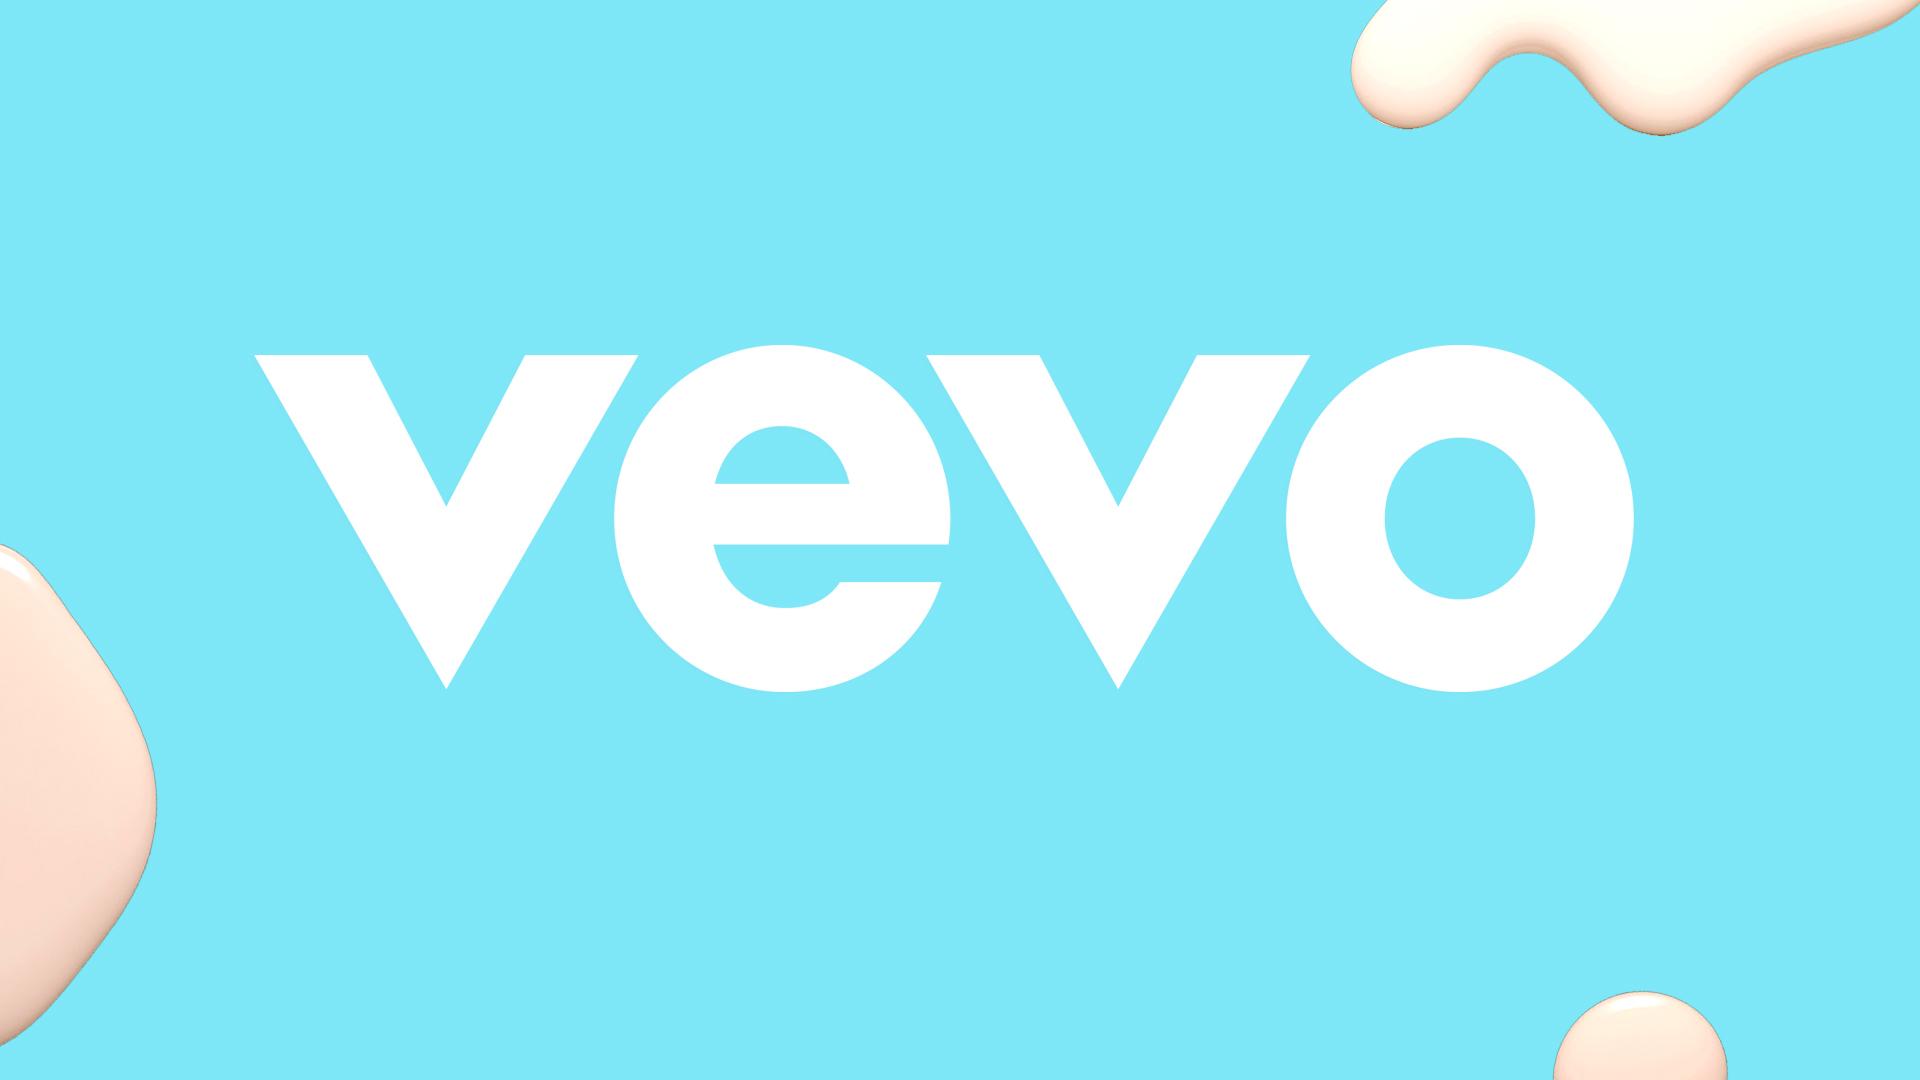 Vevo-Stickers-2.jpg